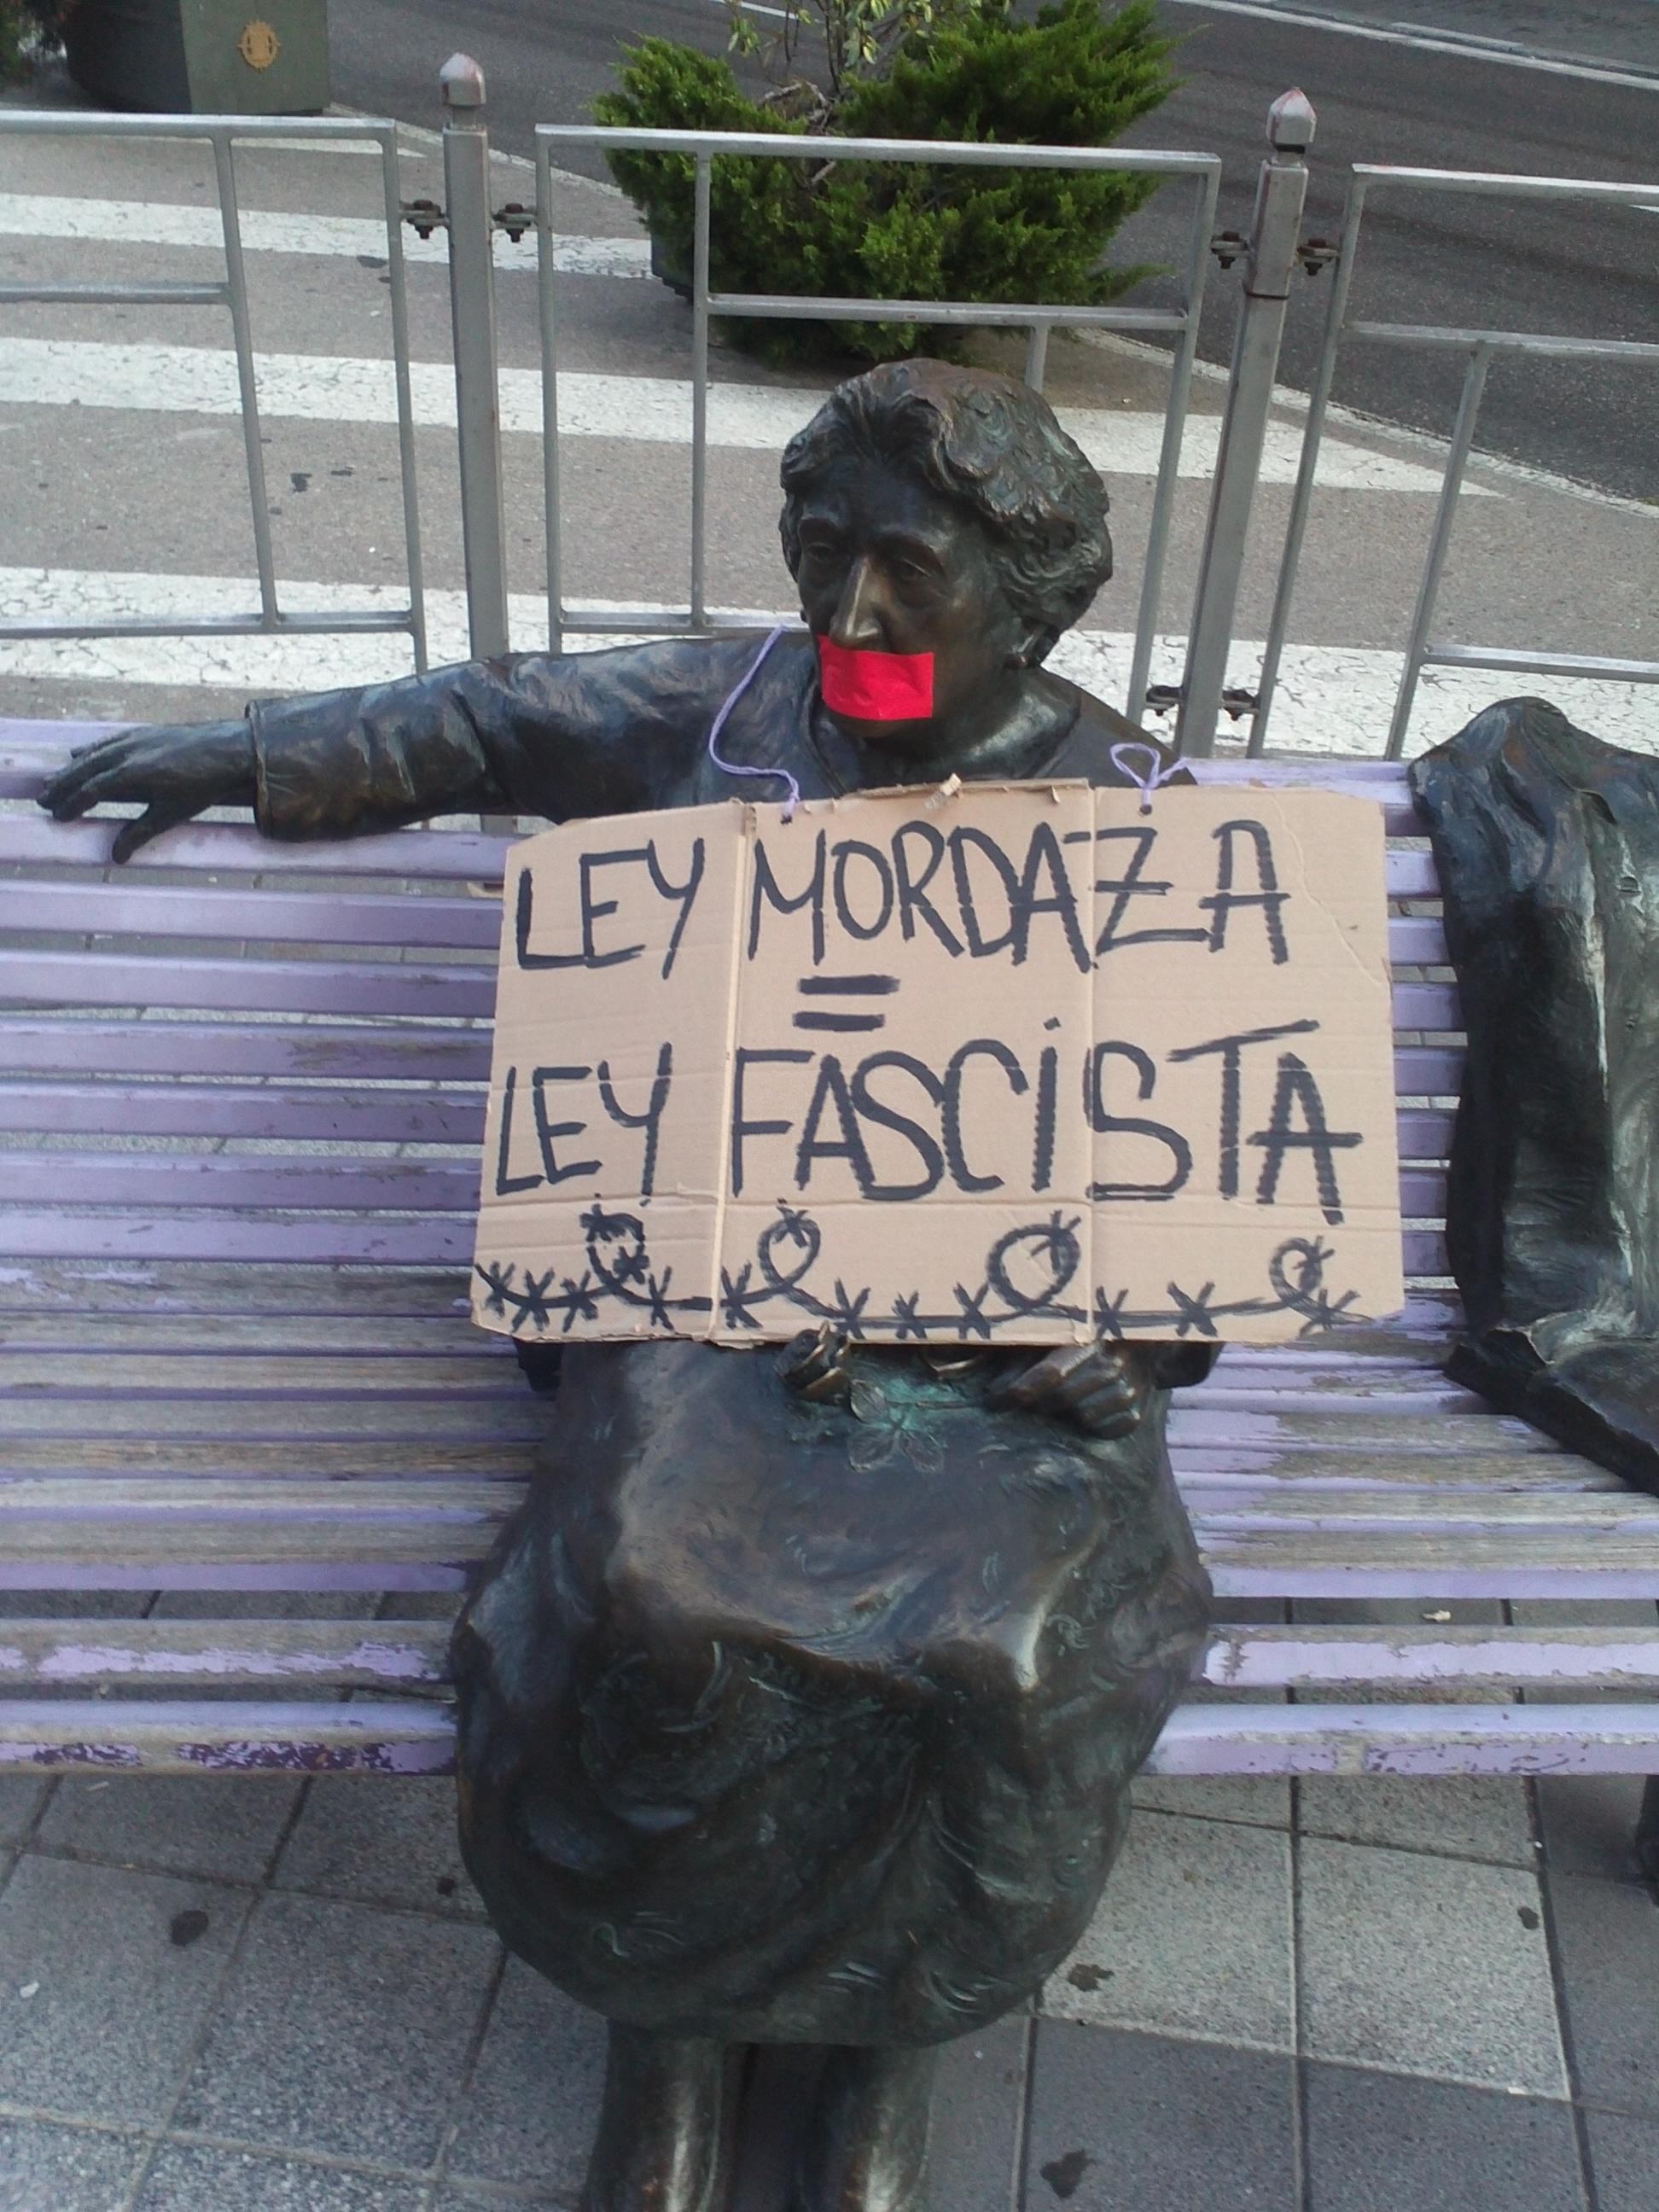 Ley Mordaza 4